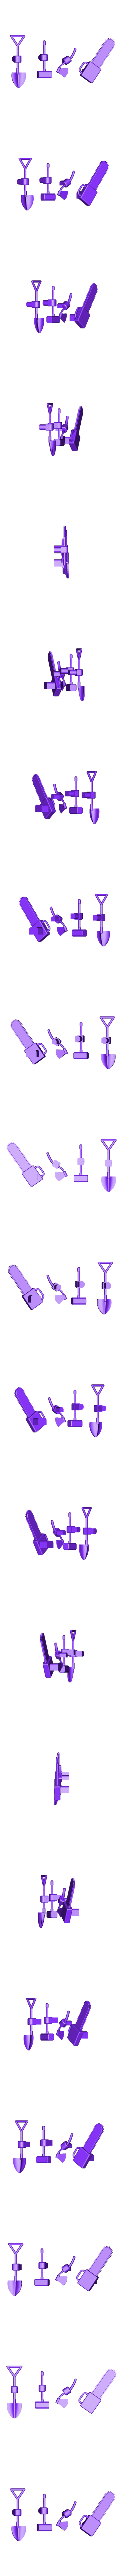 futureBear-tools.stl Download free STL file Future Bear - M5A1 Ultra Evolution • 3D printing design, cycstudio